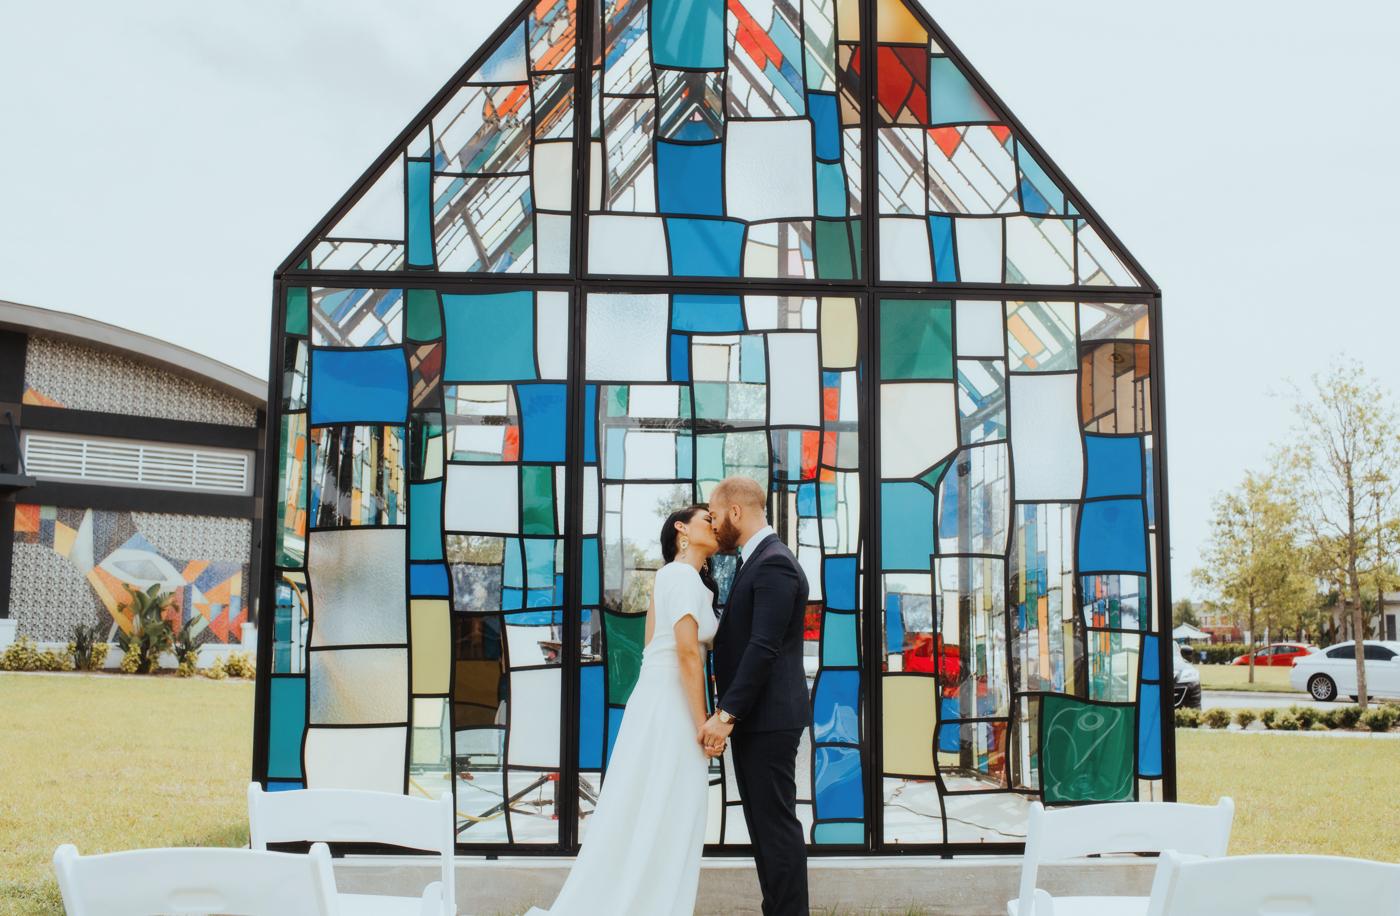 Wedding | Canvas Market | Lake Nona-Orlando, FL  | Vanessa Boy Photography | vanessaboy.com-283.com |Green Wedding Shoes.jpg